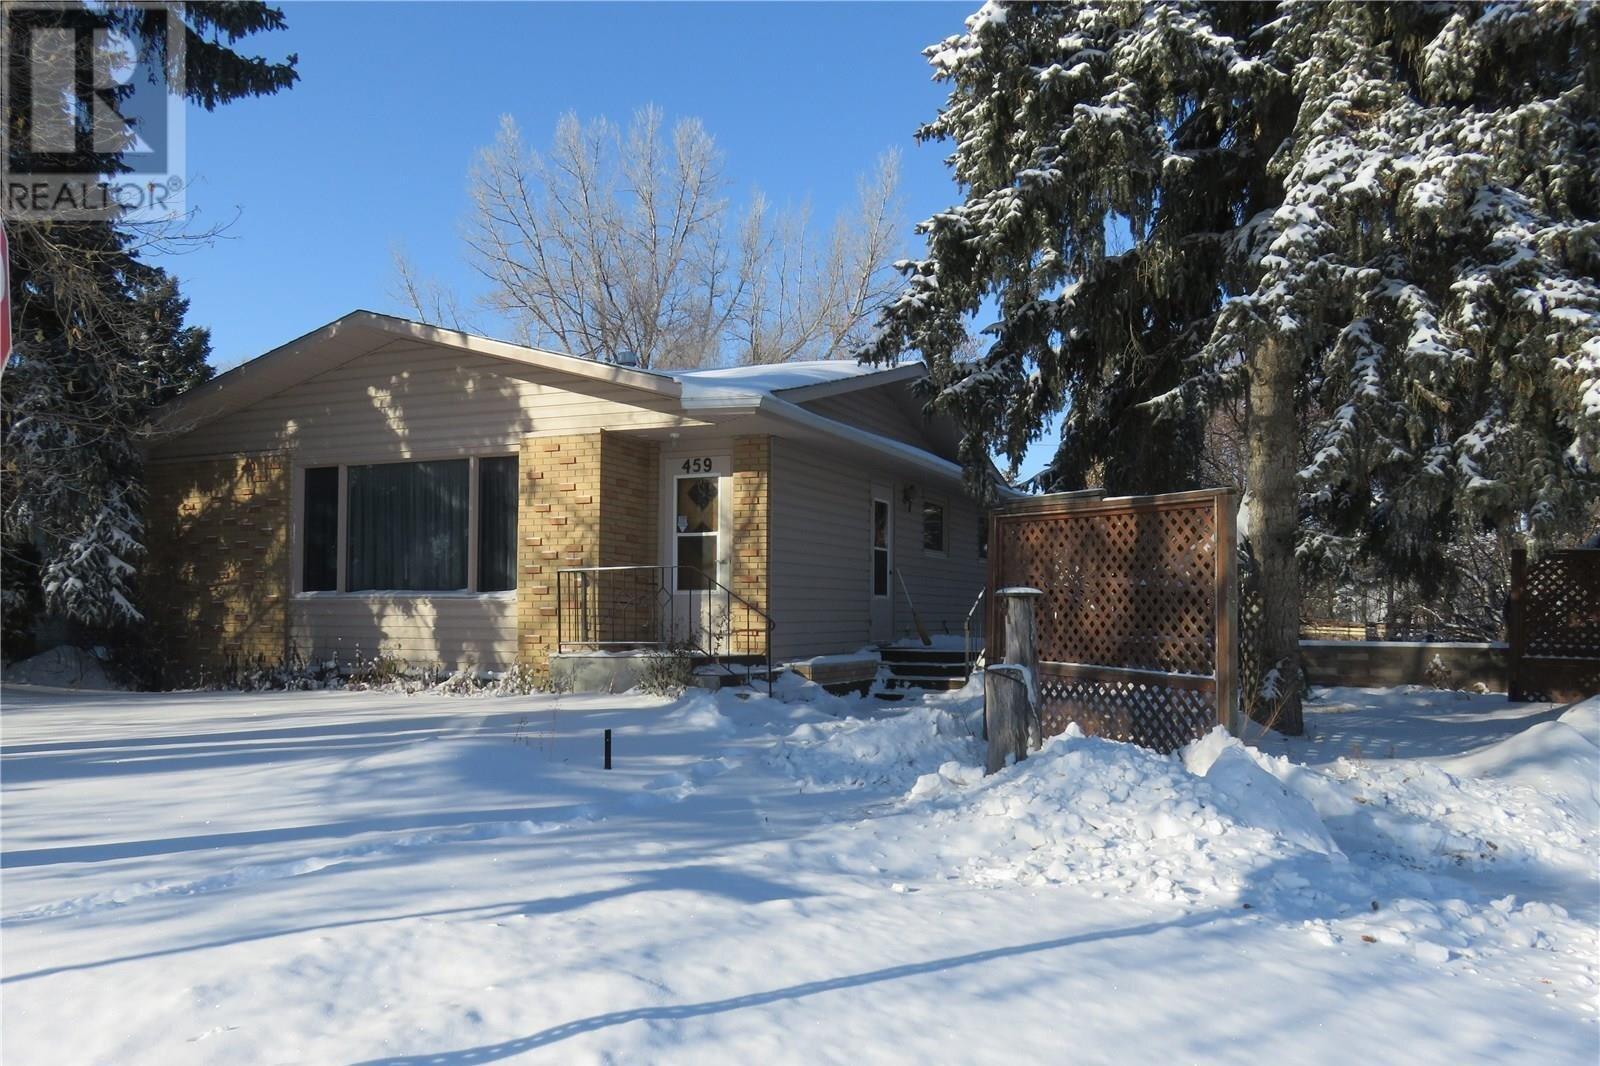 House for sale at 459 Garfield St Davidson Saskatchewan - MLS: SK834442